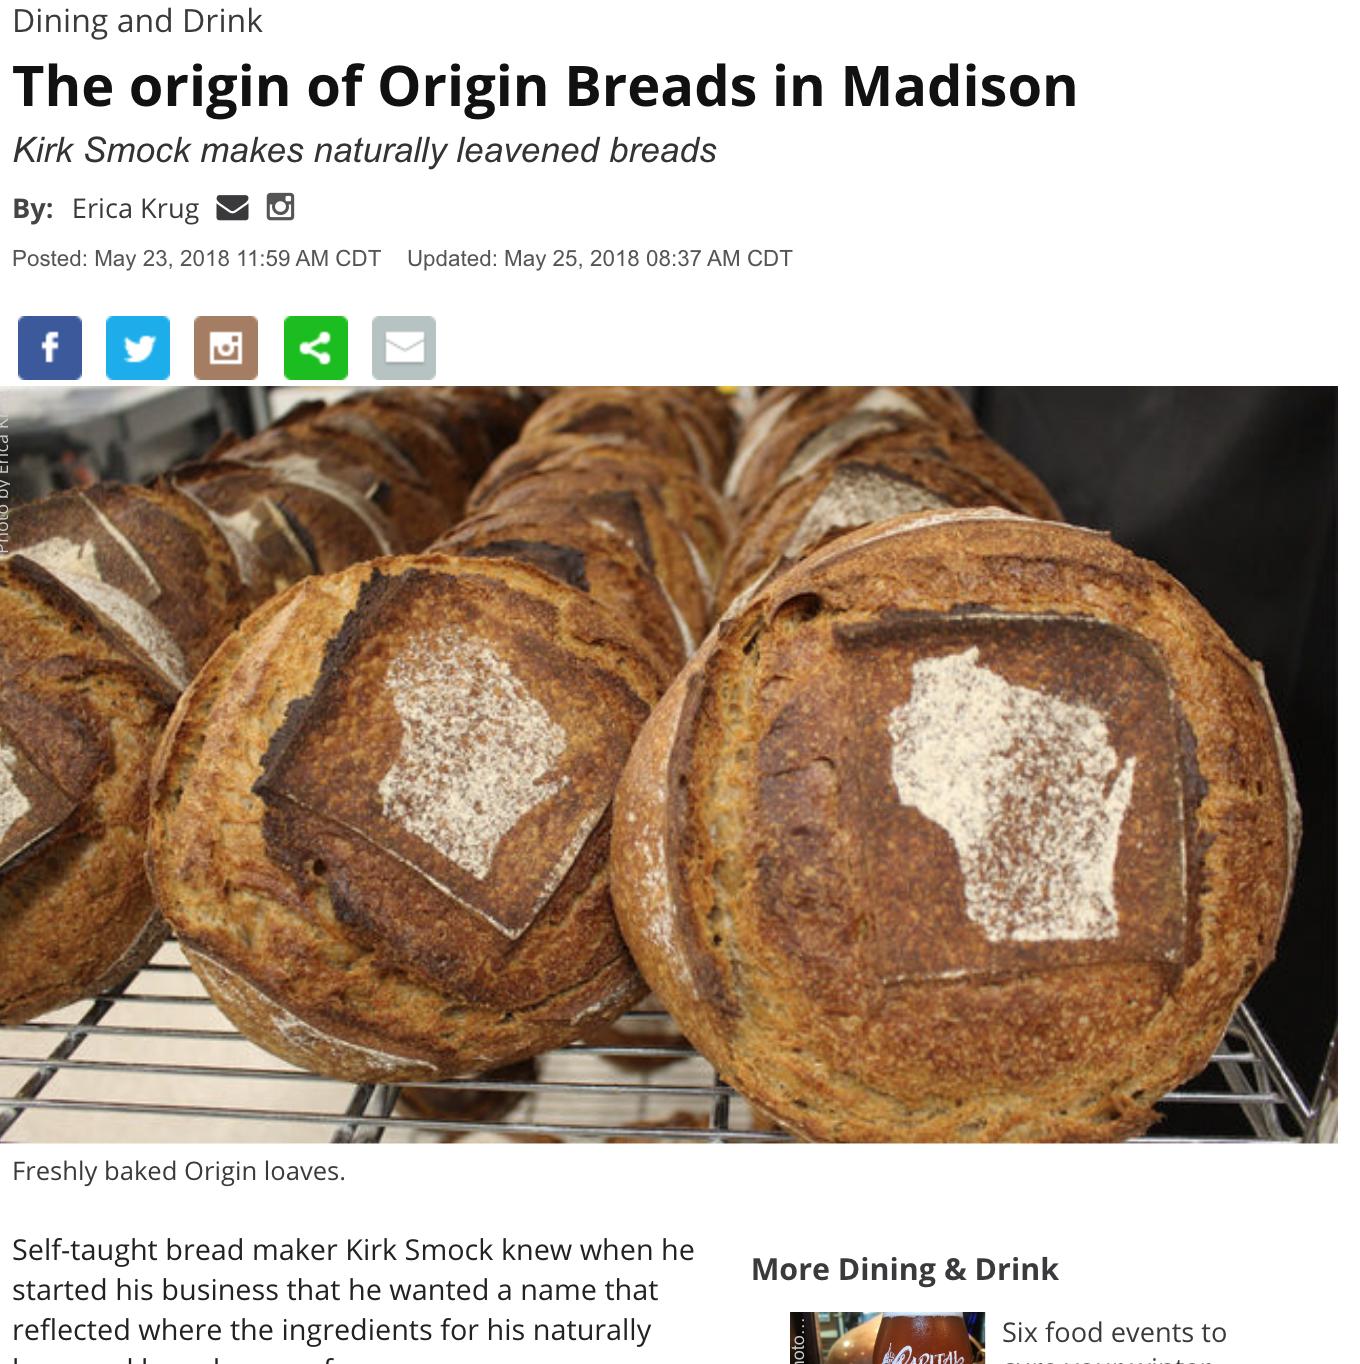 The Origin of Origin Breads in Madison